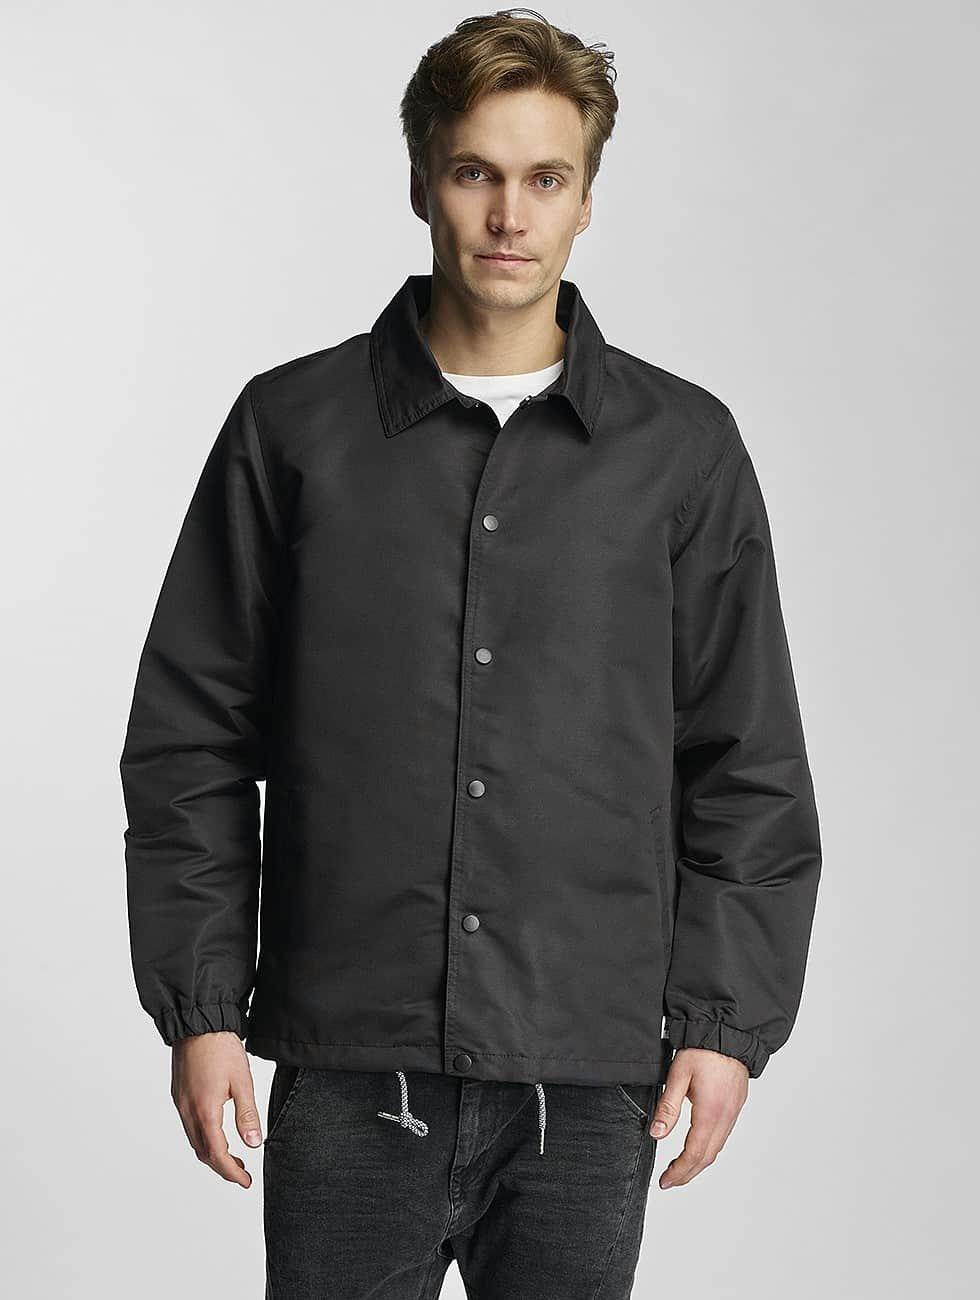 HYPE Transitional Jackets Placement Coach svart